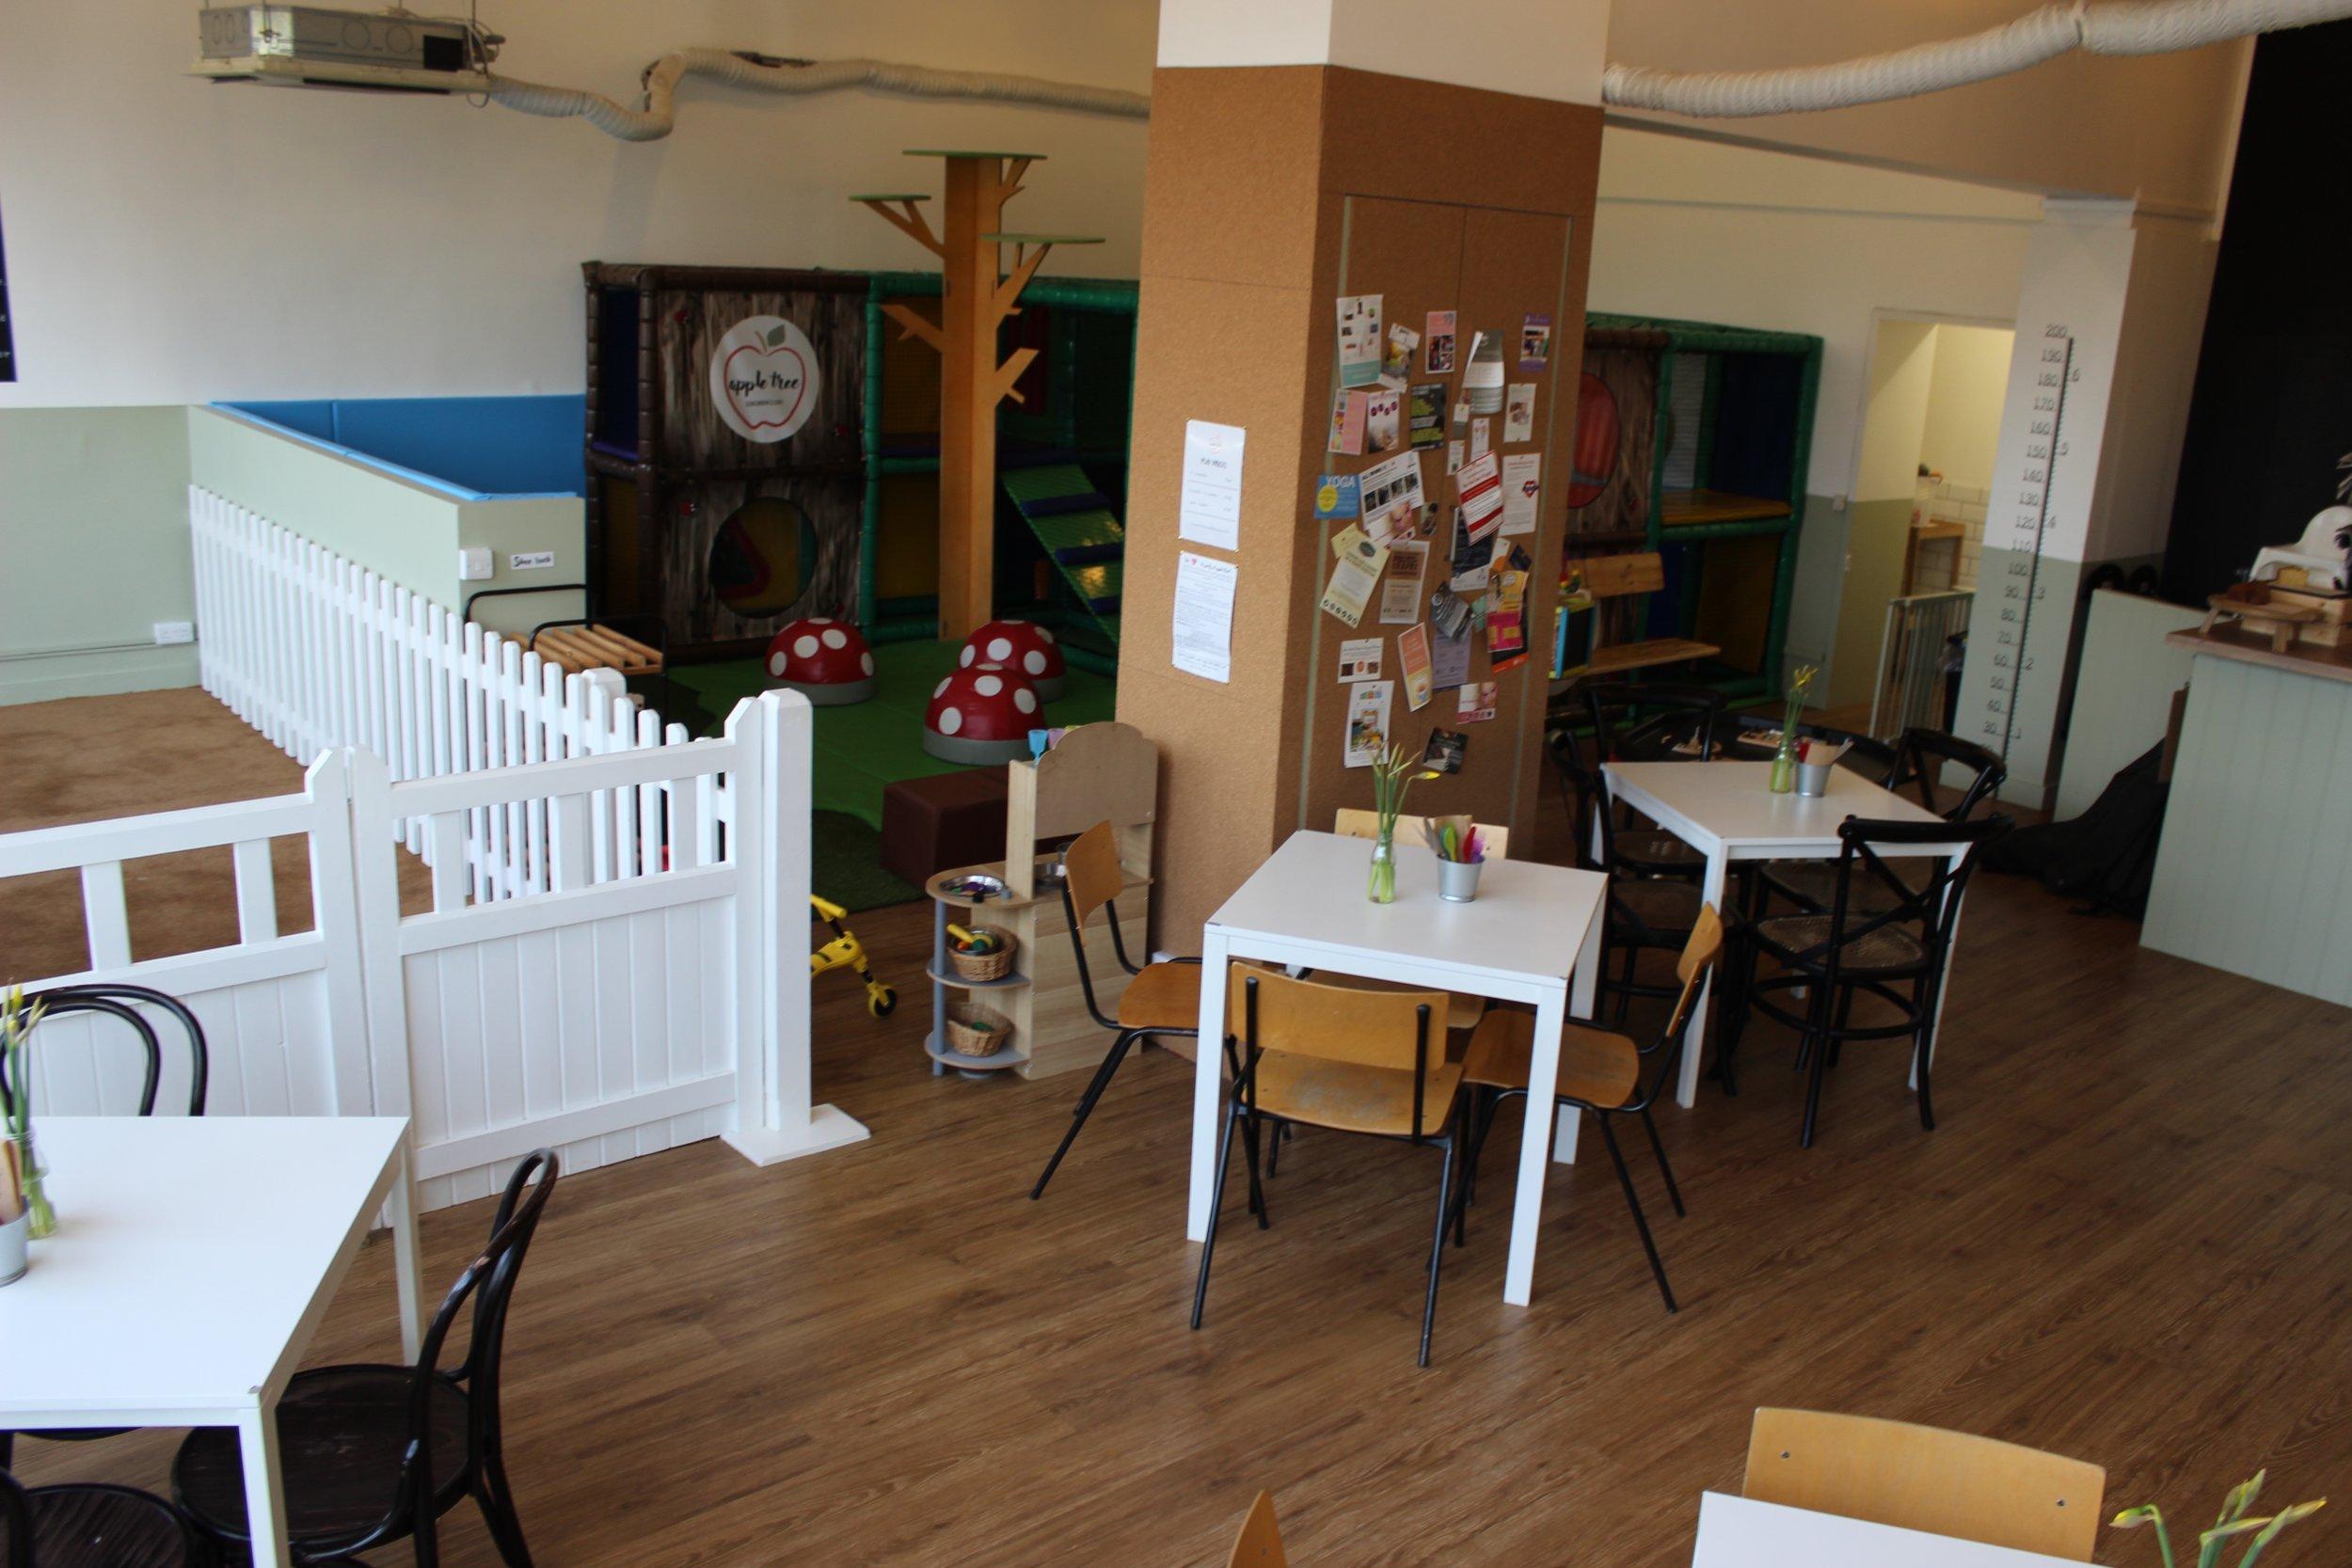 Apple Tree Children's Cafe in Herne Hill South London 6.jpg